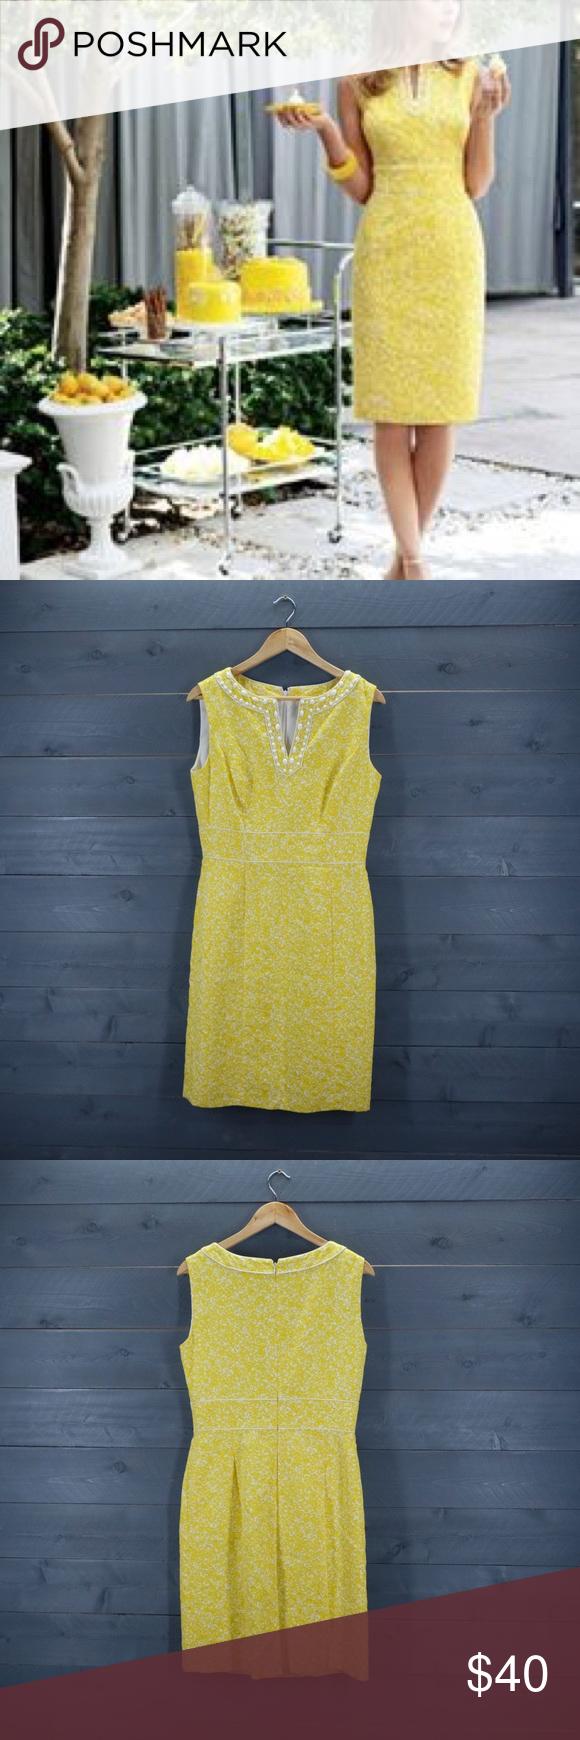 Tahari Yellow And White Brocade Sheath Dress Clothes Design Dresses Sheath Dress [ 1740 x 580 Pixel ]